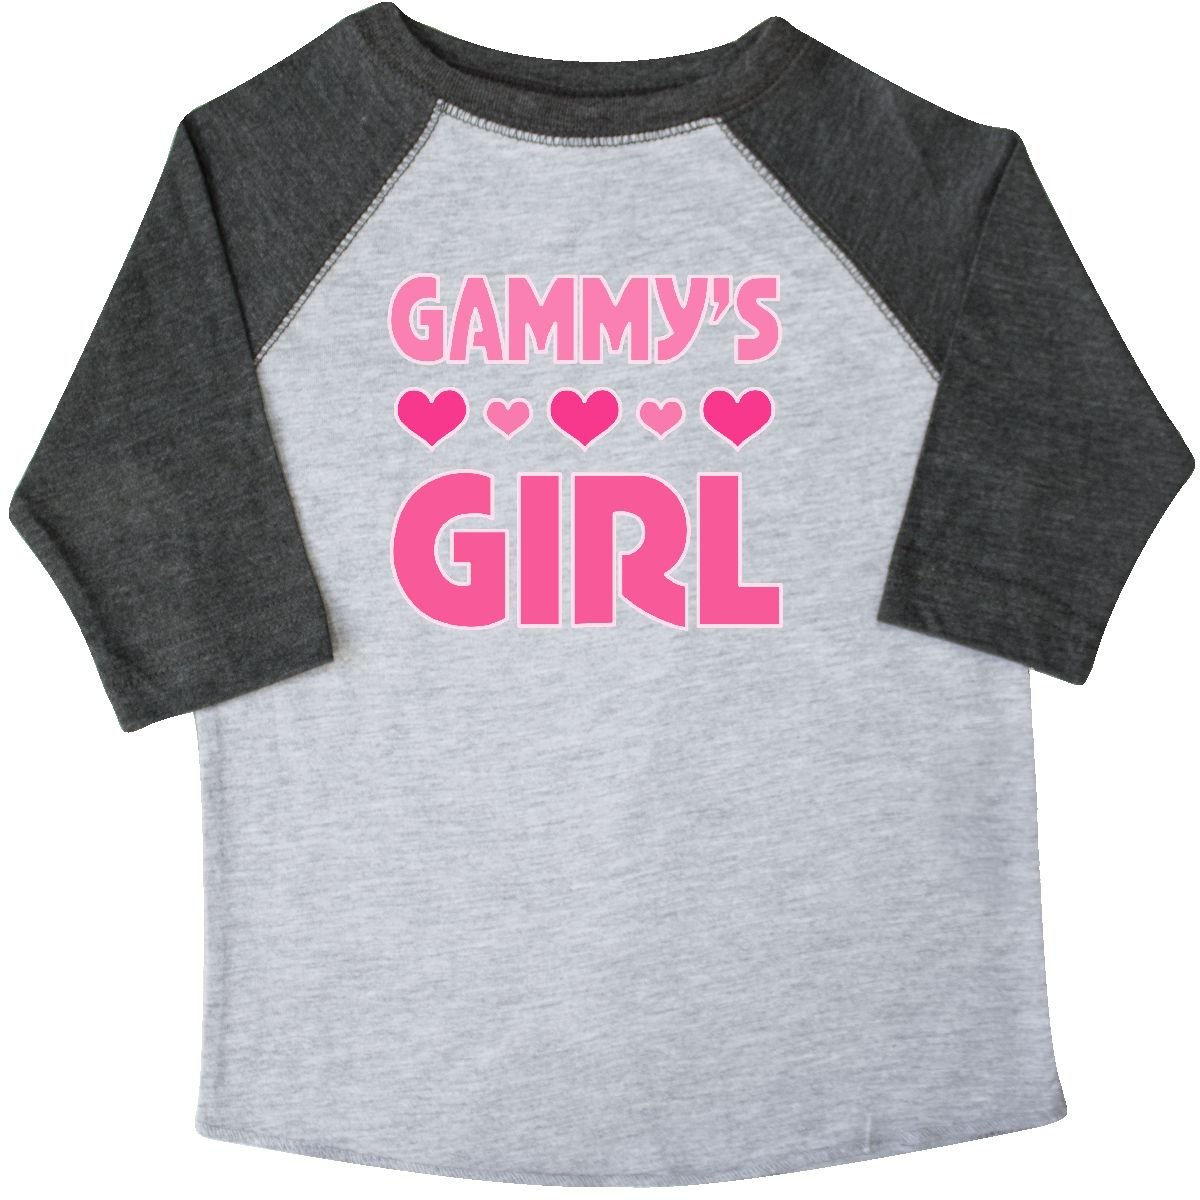 inktastic - Gammy Girl Granddaughter Gift Toddler T-Shirt 309f6 14-199158-164